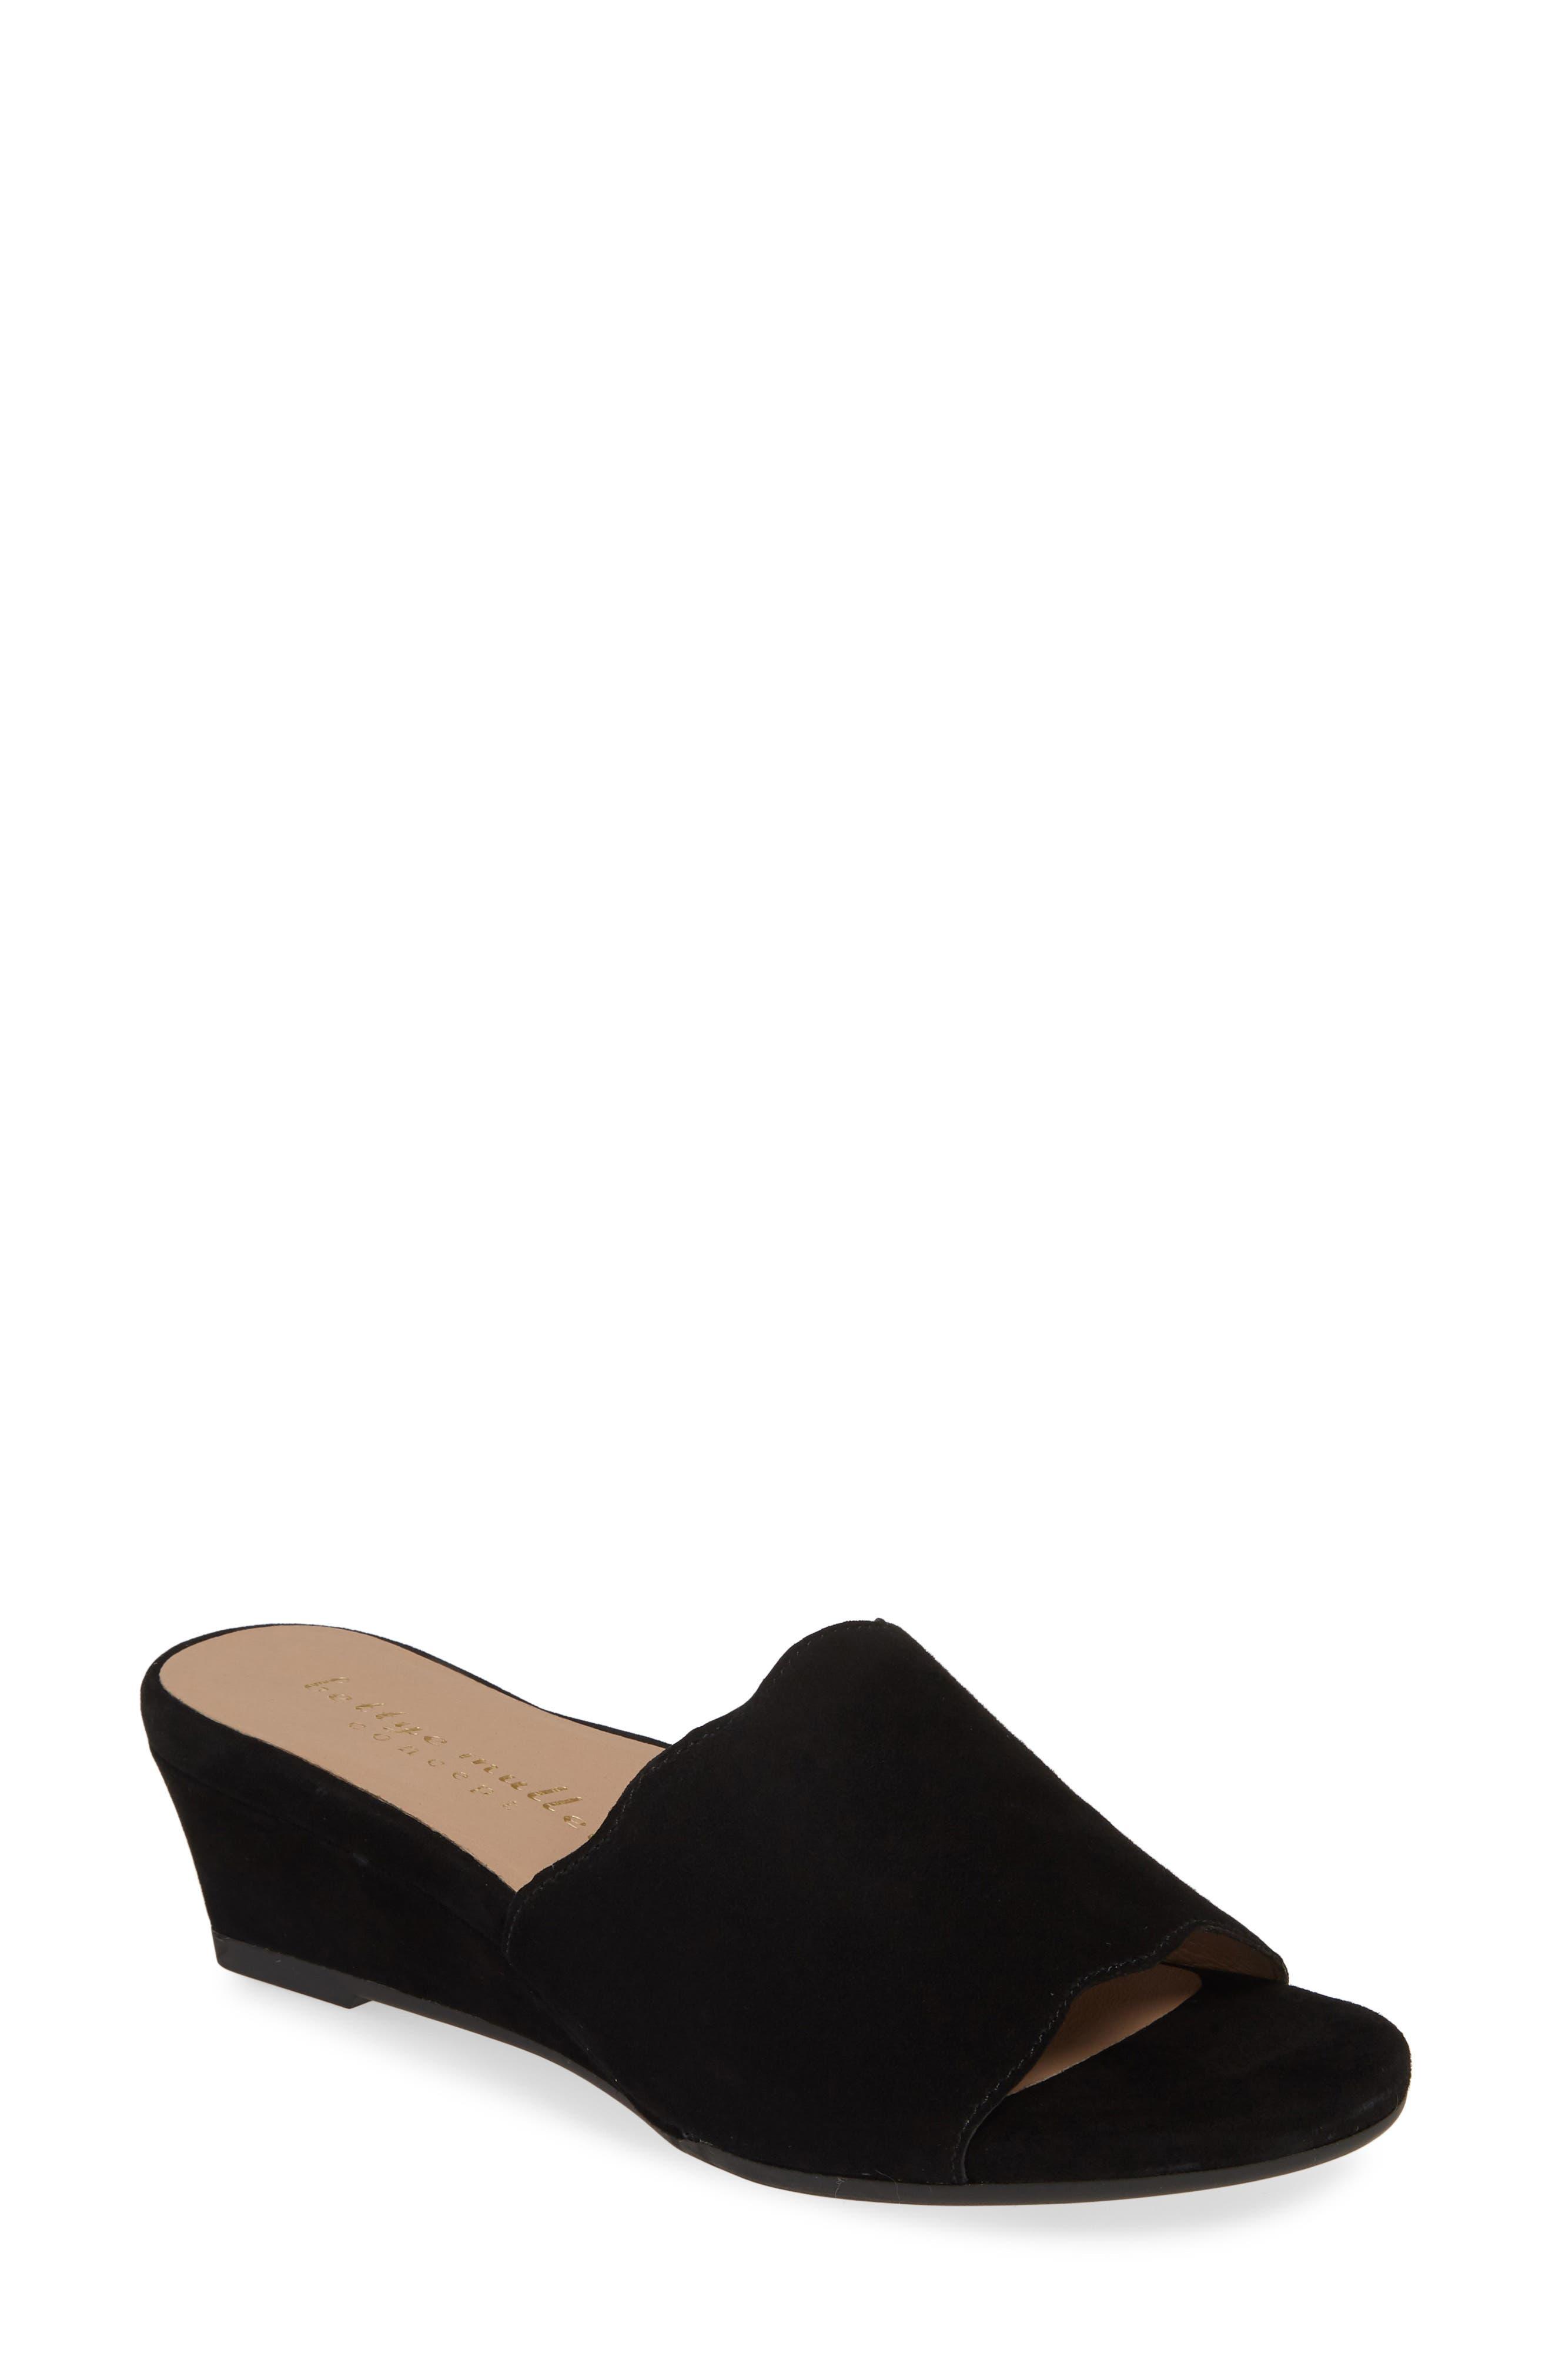 Bettye Muller Concepts Seema Slide Sandal, Black